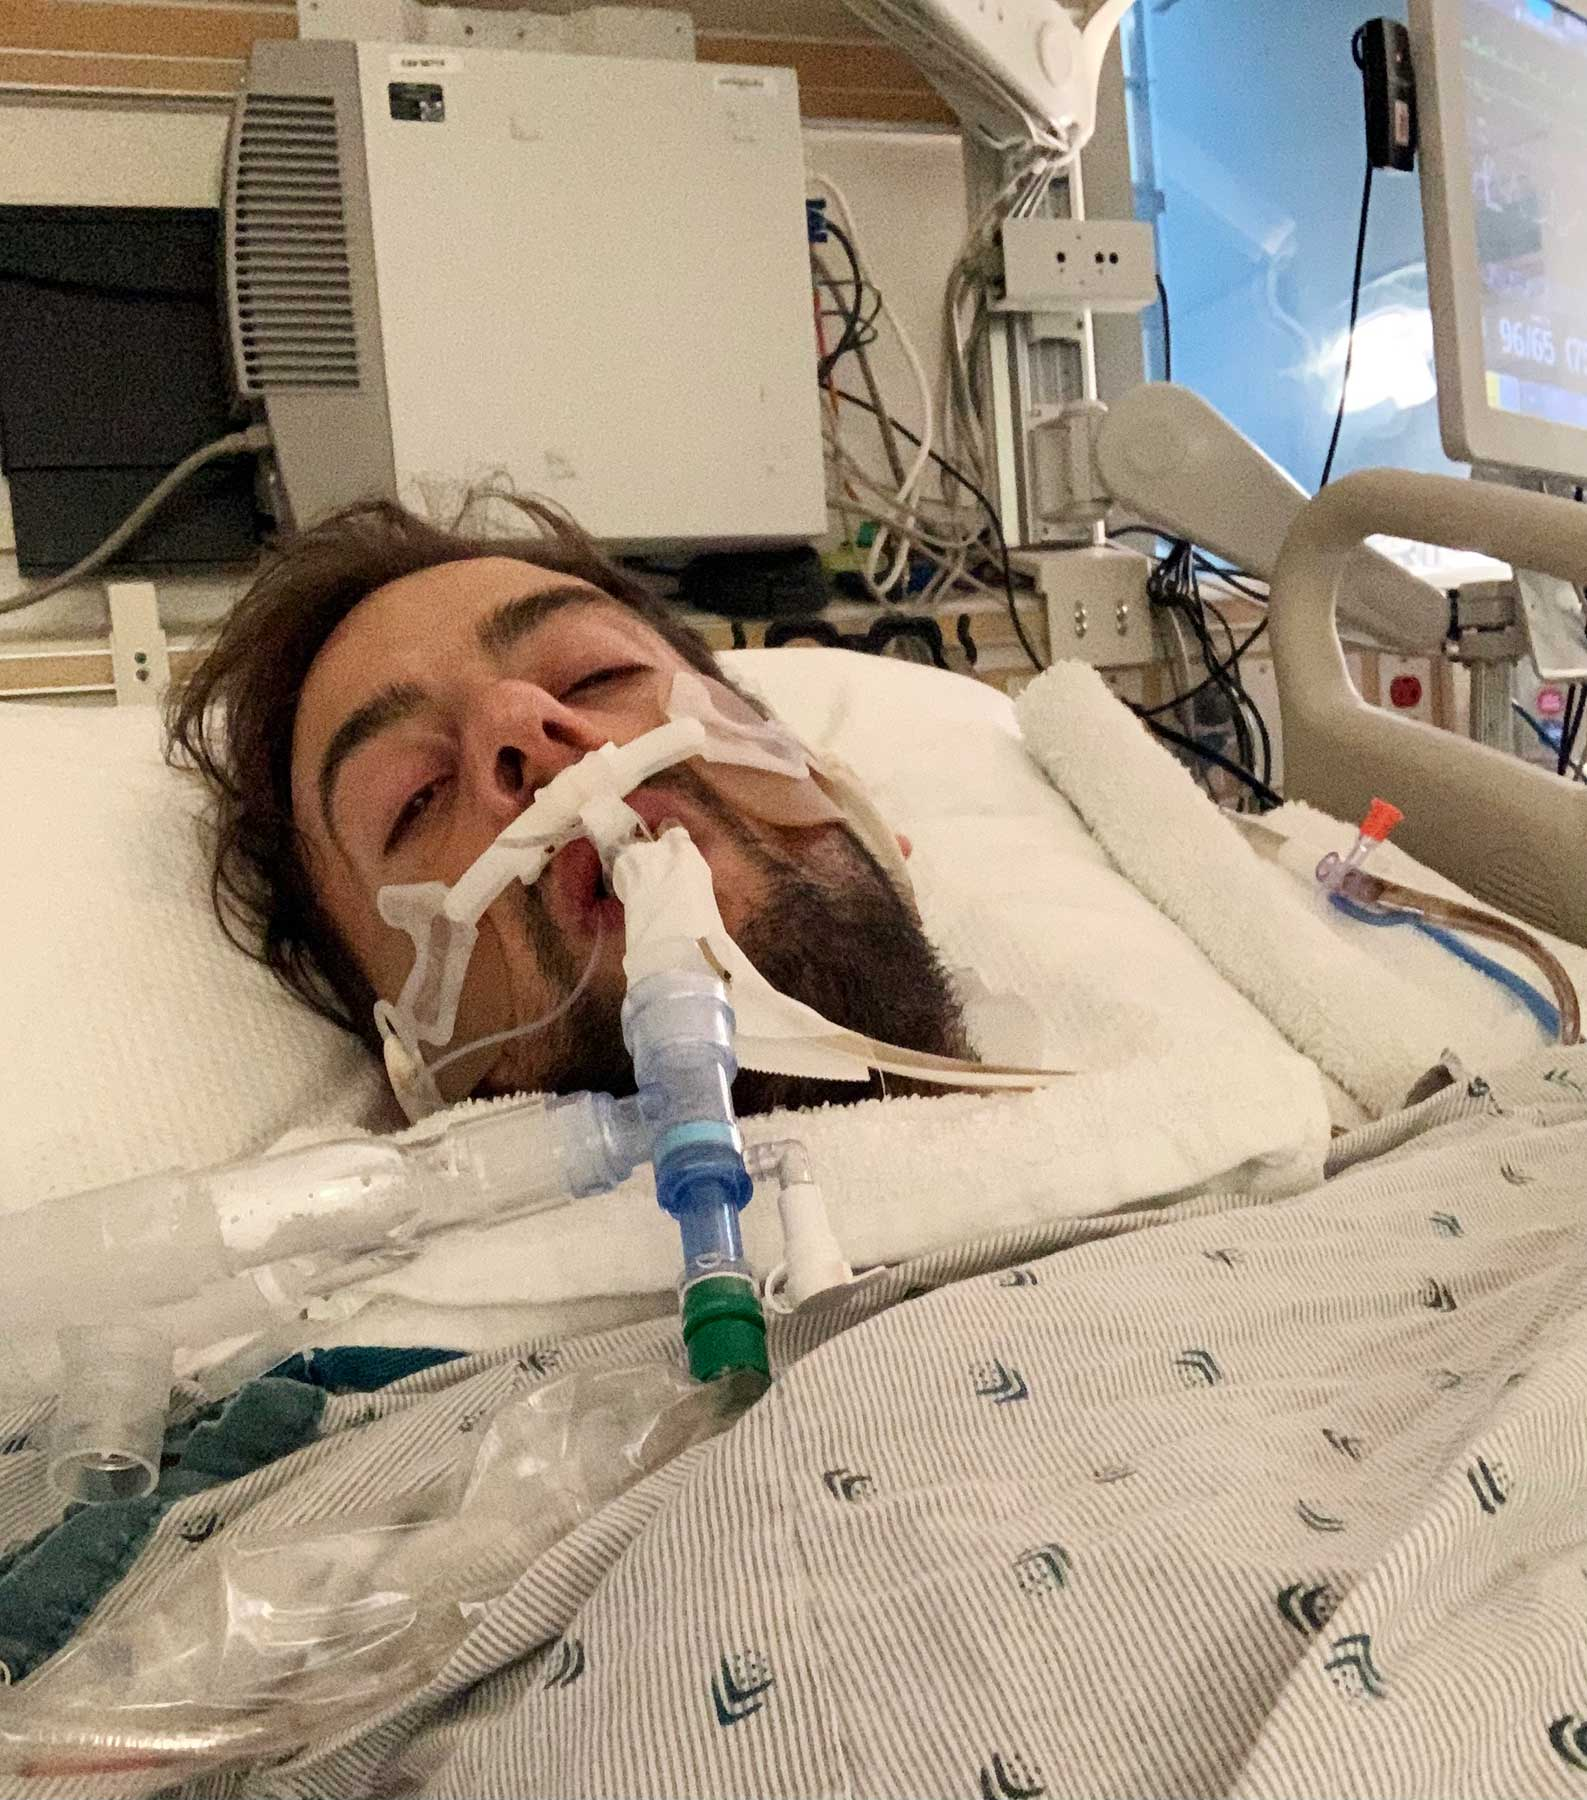 ryan in hospital